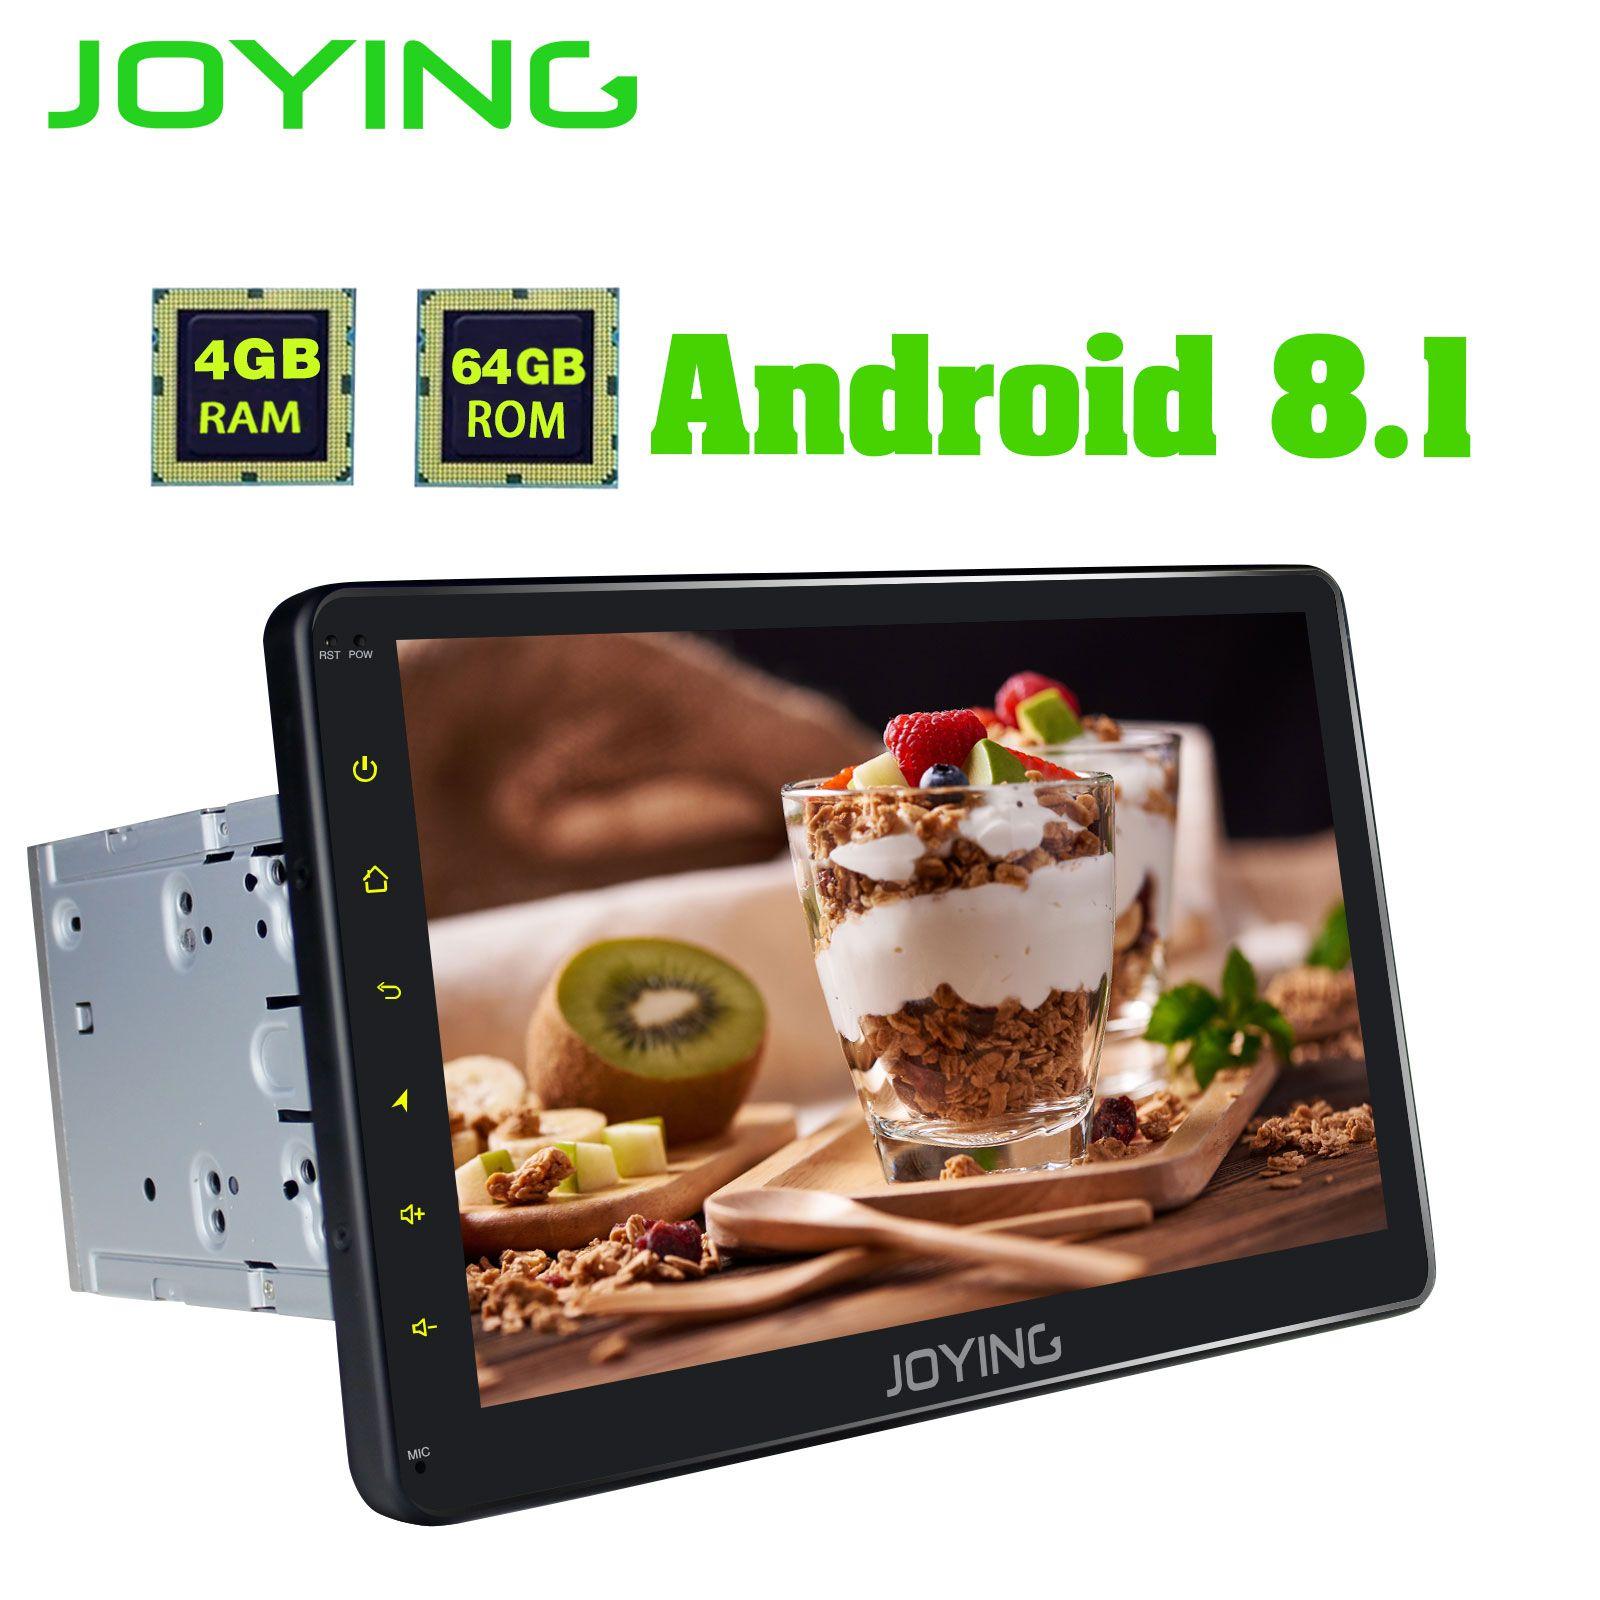 Android 8.1 2 din autoradio Octa Core 4GB + 64GB 10.1 IPS 1280*720 prise en charge HD 4G/lecteur de cassette radio sans fil Carplay/DSP/SWC